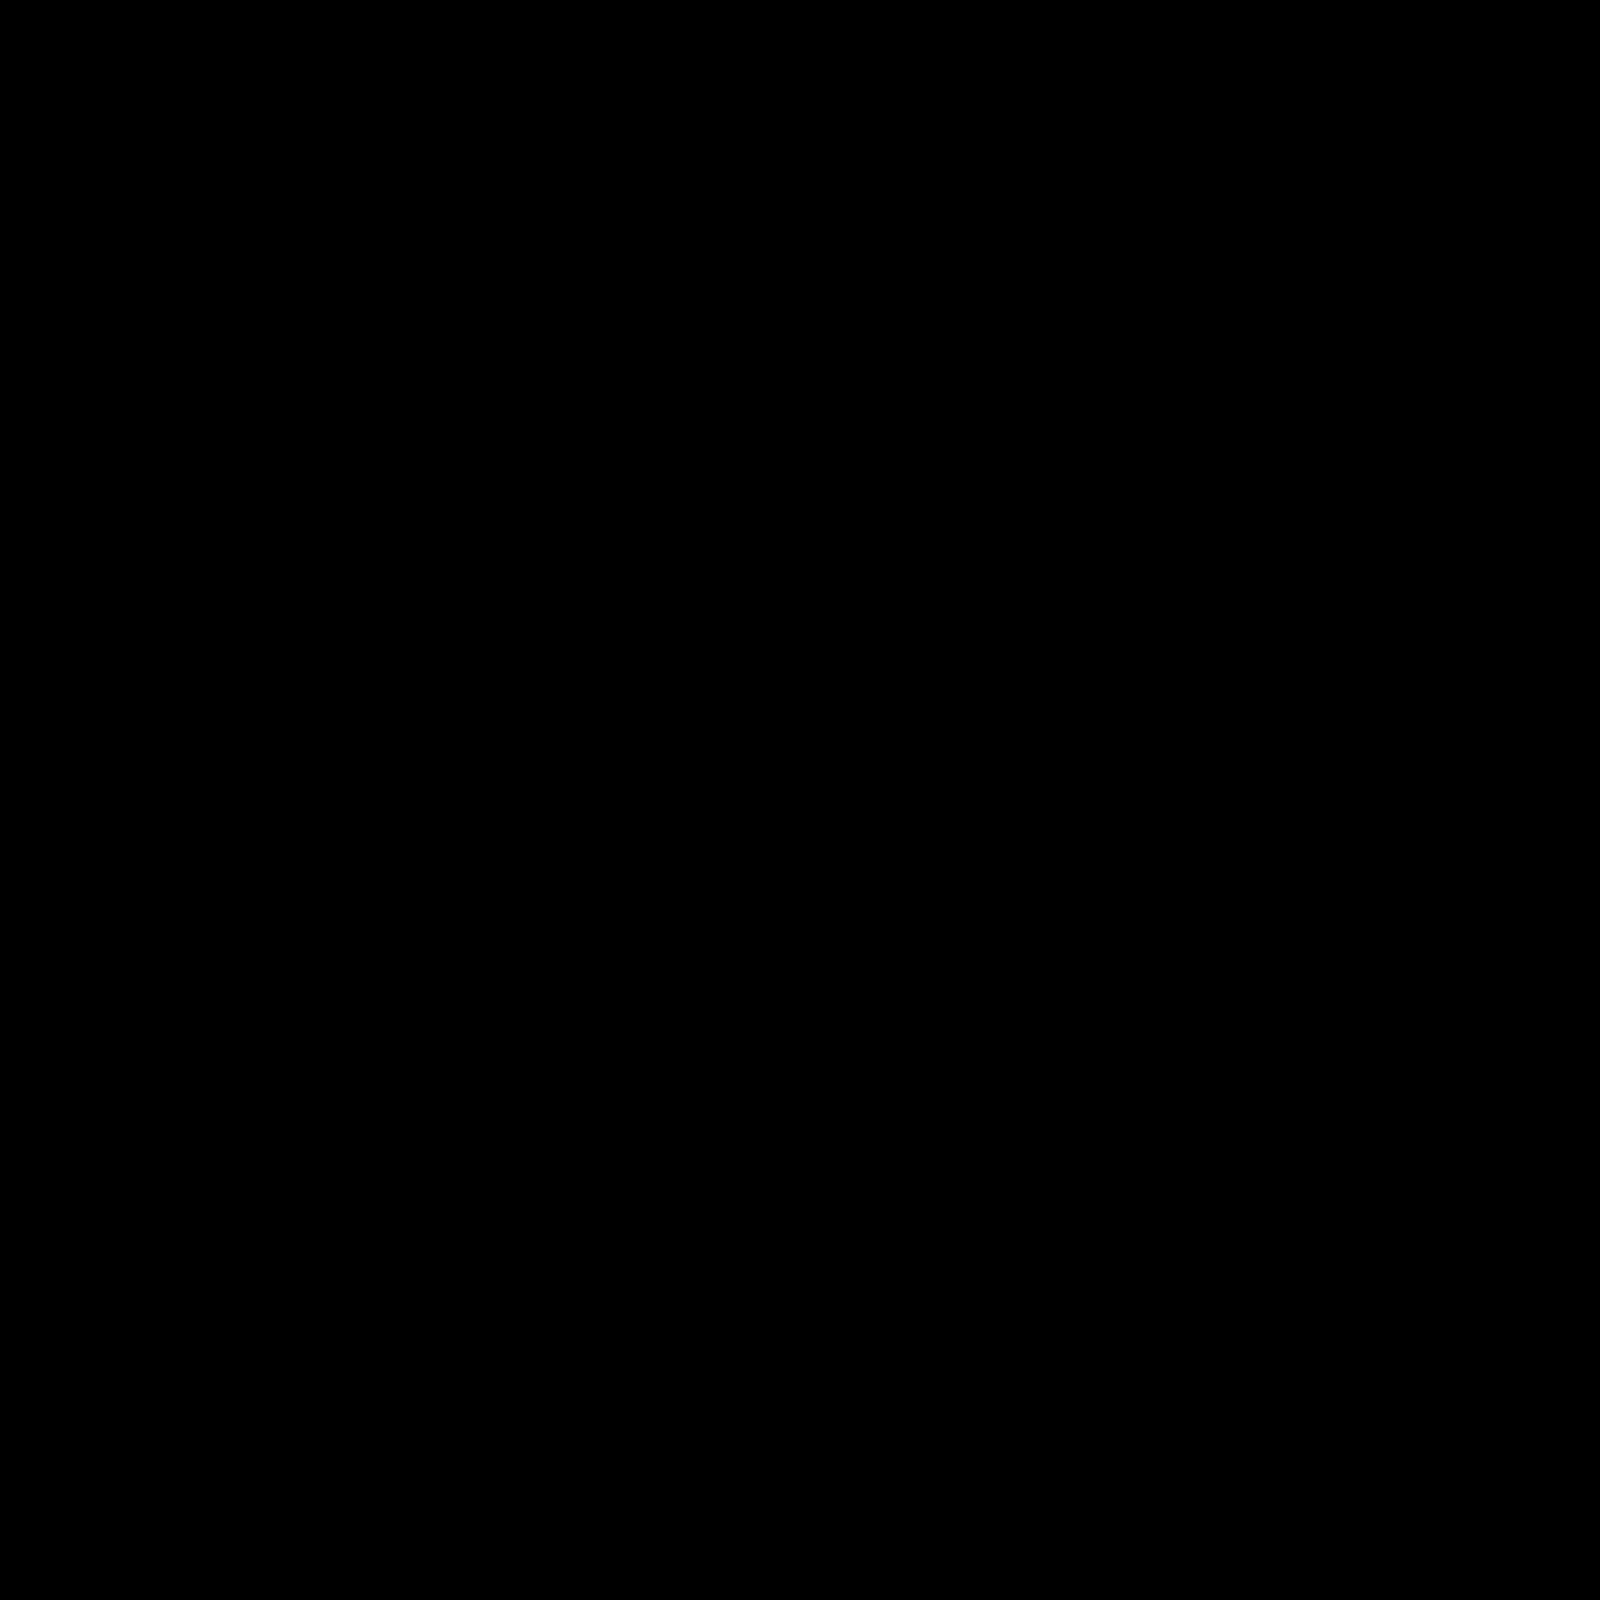 Wedding Filled icon